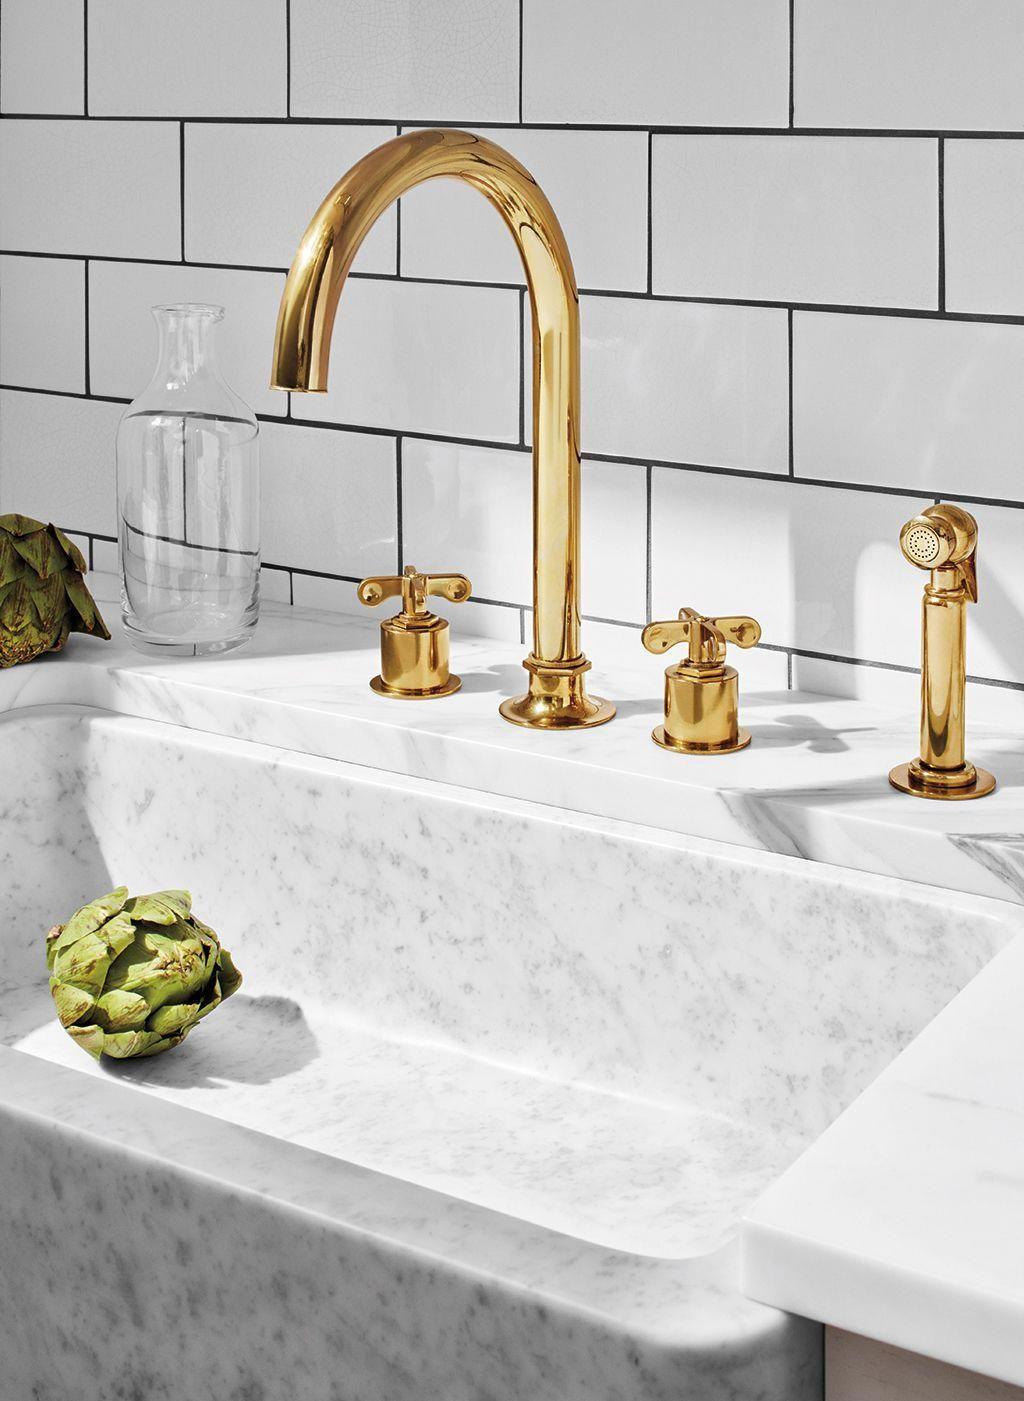 Henry Three Hole Gooseneck Kitchen Faucet Luxury Kitchens Faucet